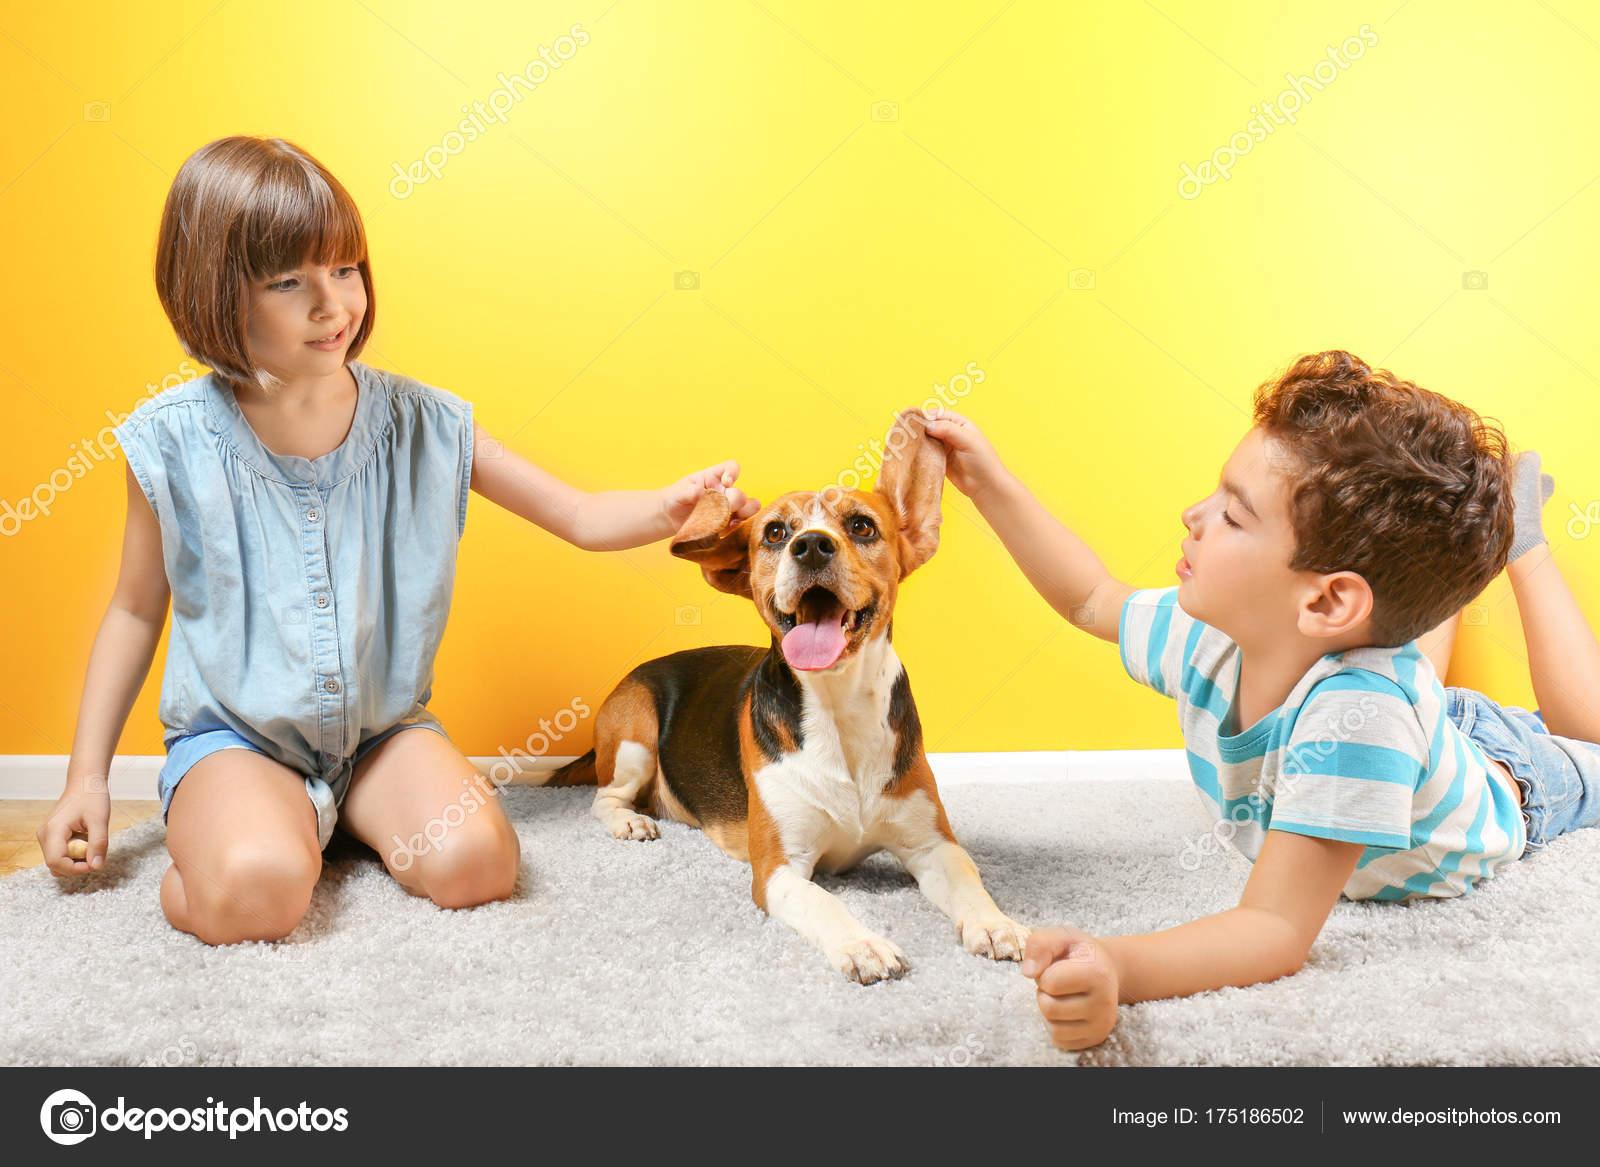 21fc228804f Χαριτωμένα παιδιά παίζει με το σκυλί κοντά σε χρώμα τοίχου — Φωτογραφία  Αρχείου